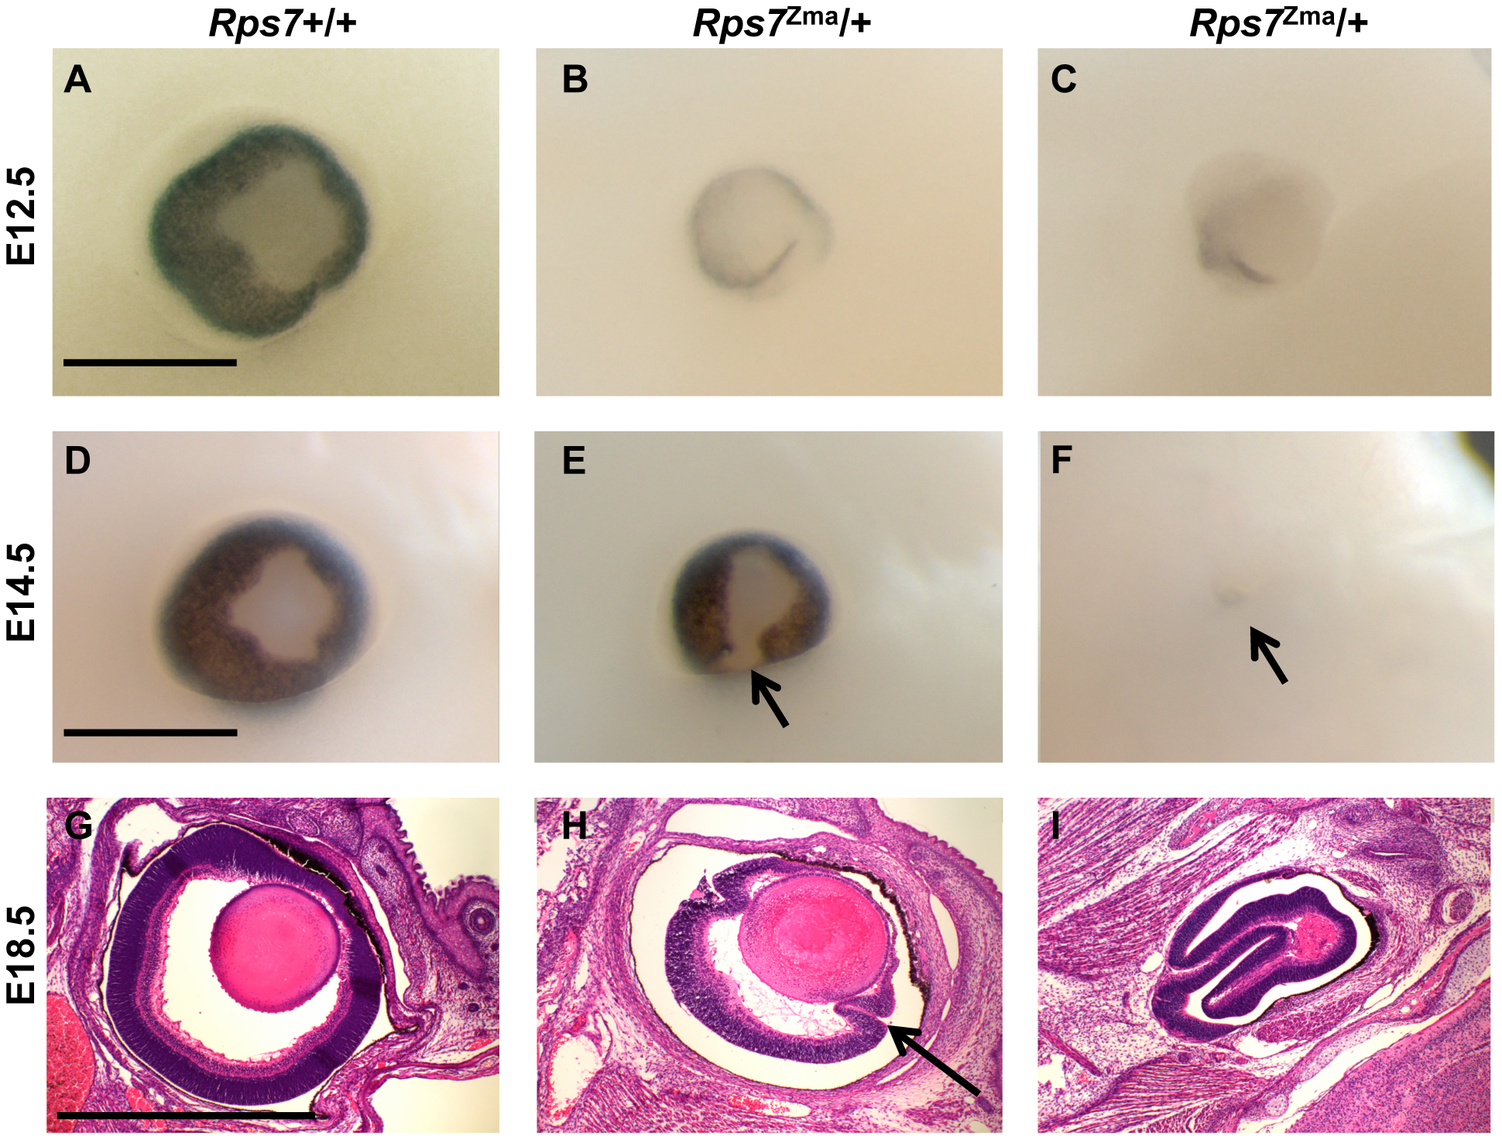 Eye dysmorphology in <i>Rps7</i> mutants.